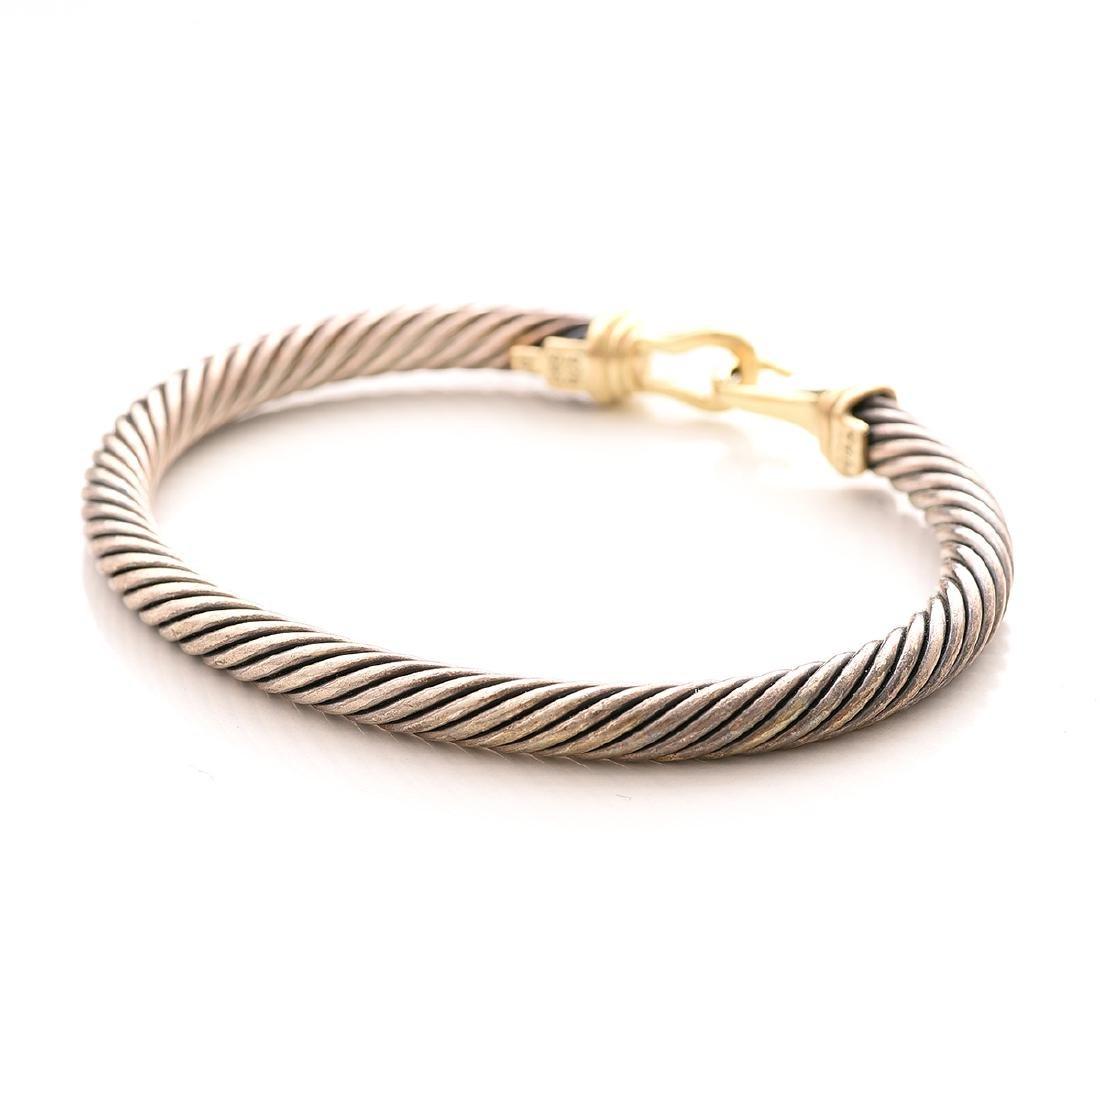 David Yurman, 14k Gold, Sterling Silver Jewelry Suite. - 3